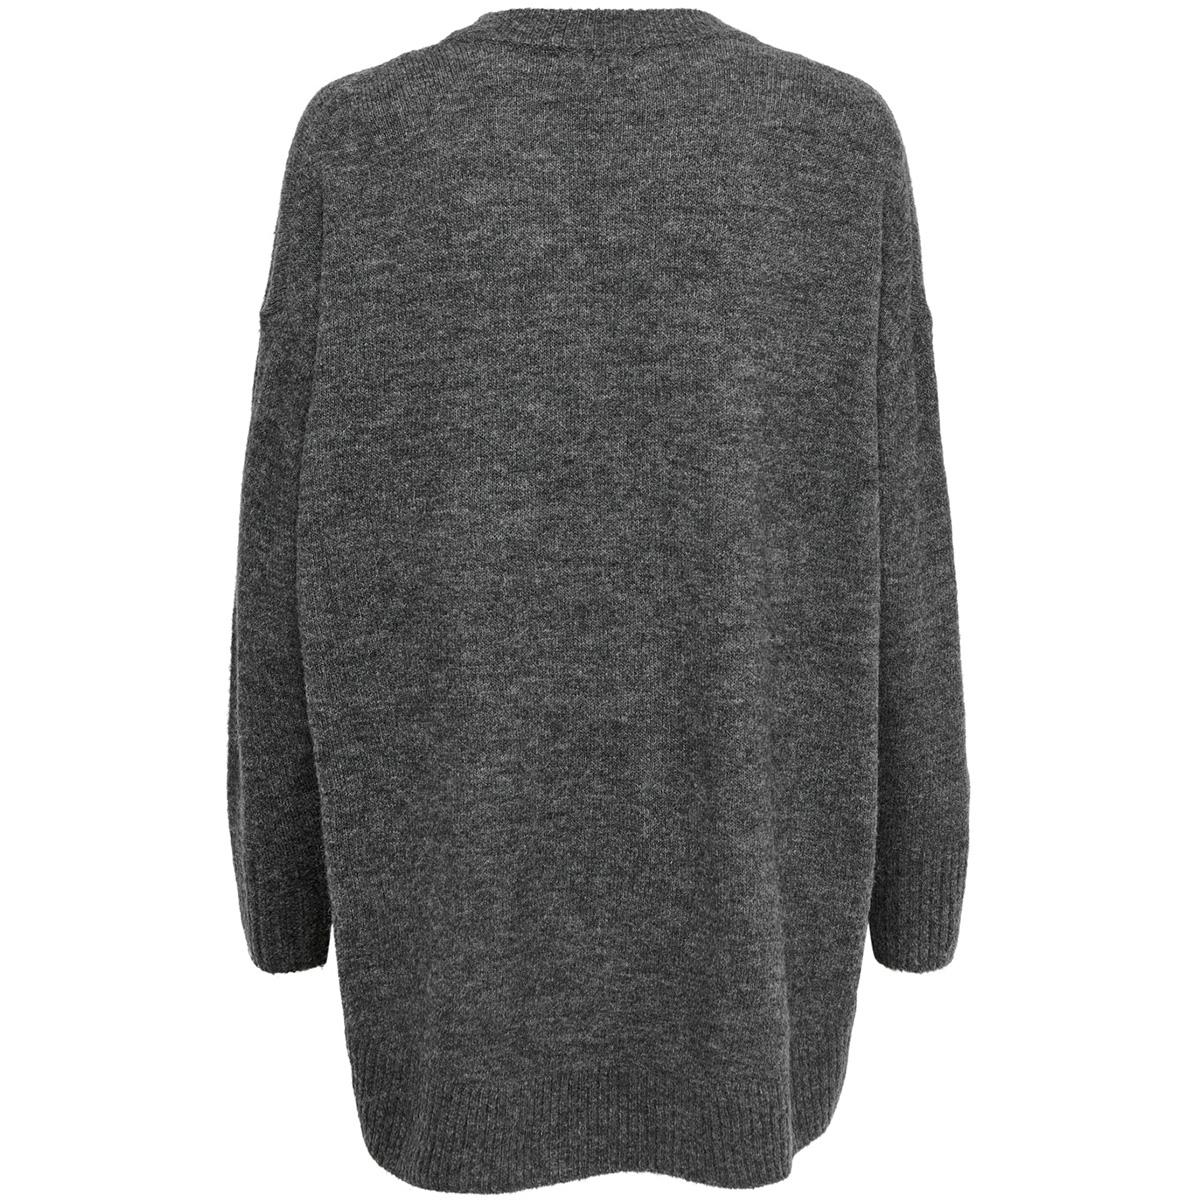 onlmirna l/s long pullover knt 15184001 only trui dark grey melange